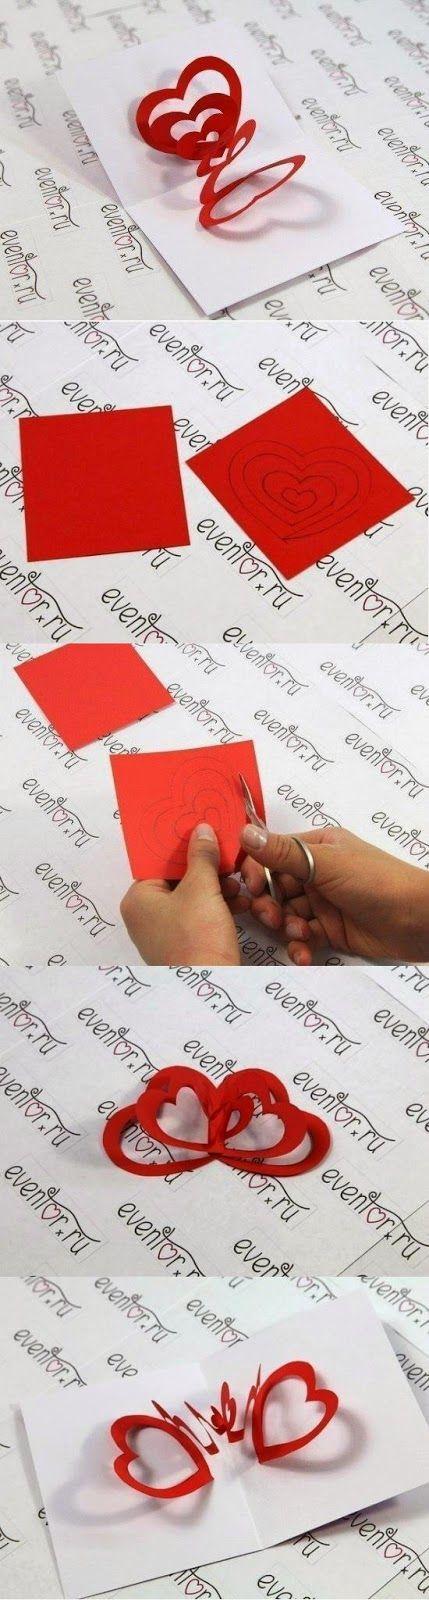 DIY : How to make a valentines card #diysaintvalentin